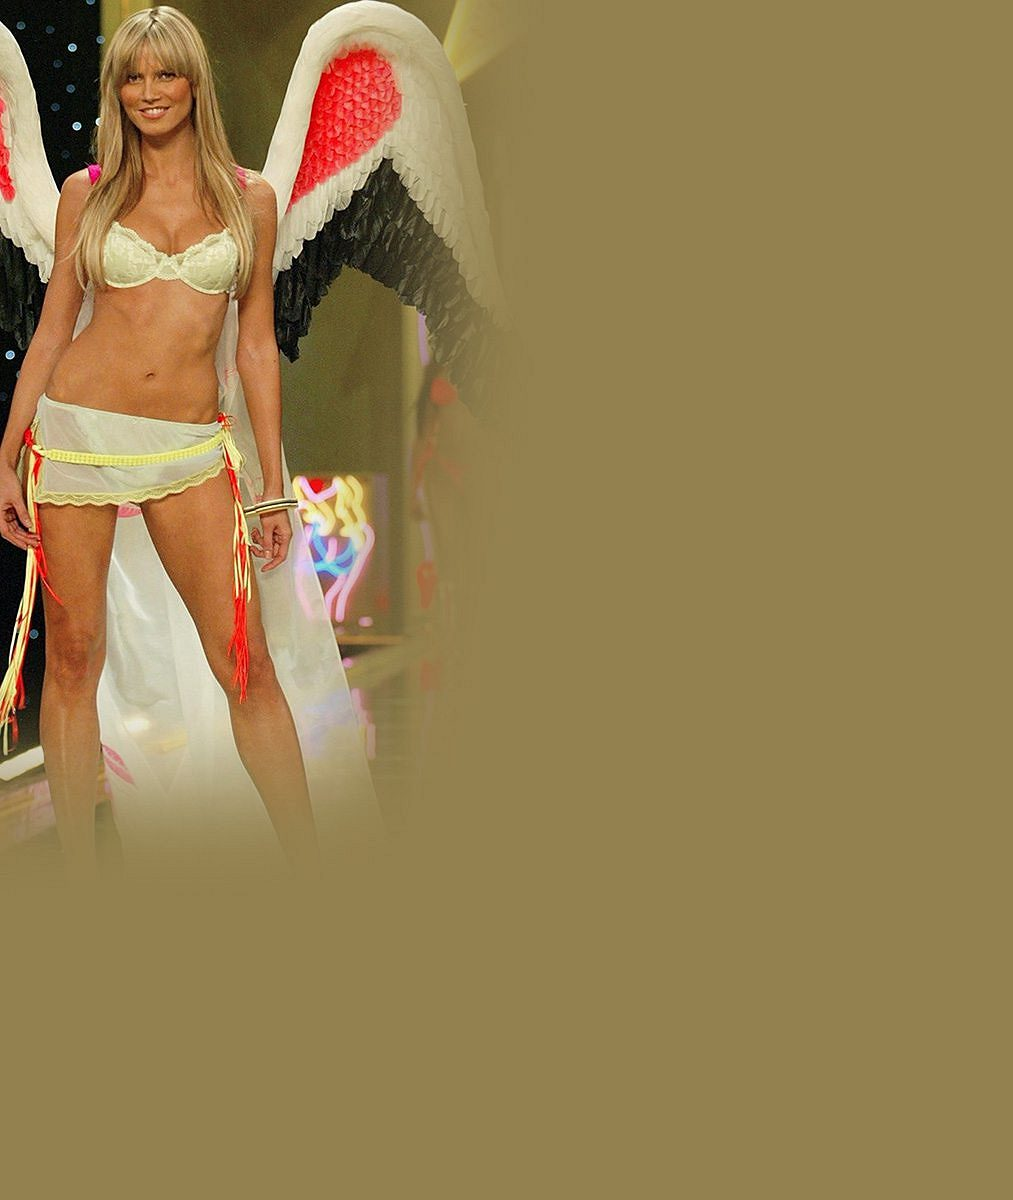 Souboj titánek: Heidi Klum vyfoukla slavné kolegyni miliardový kšeft! Která kráska ostrouhala?